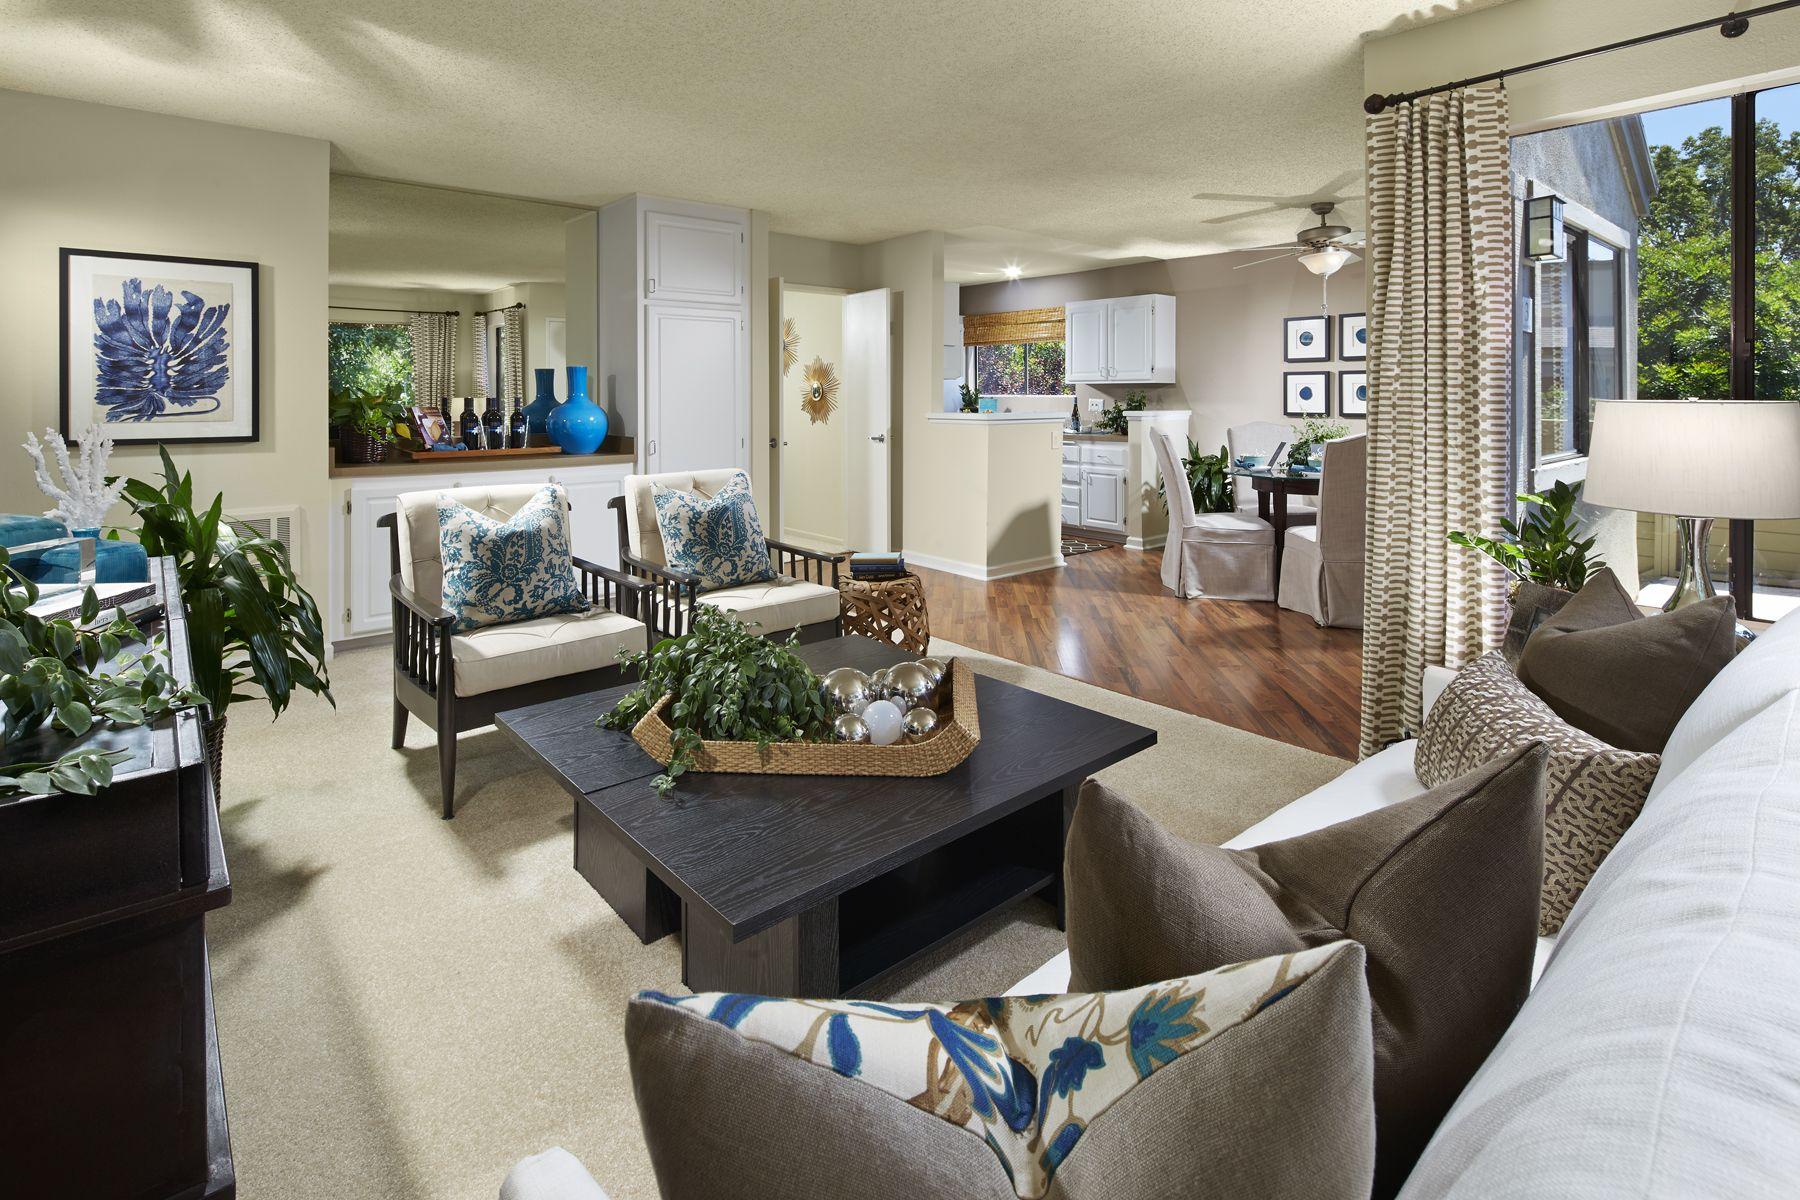 2 Bedroom Model At Woodbridge Apartments In Irvine Ca Wood Bridge Outdoor Furniture Sets Apartment